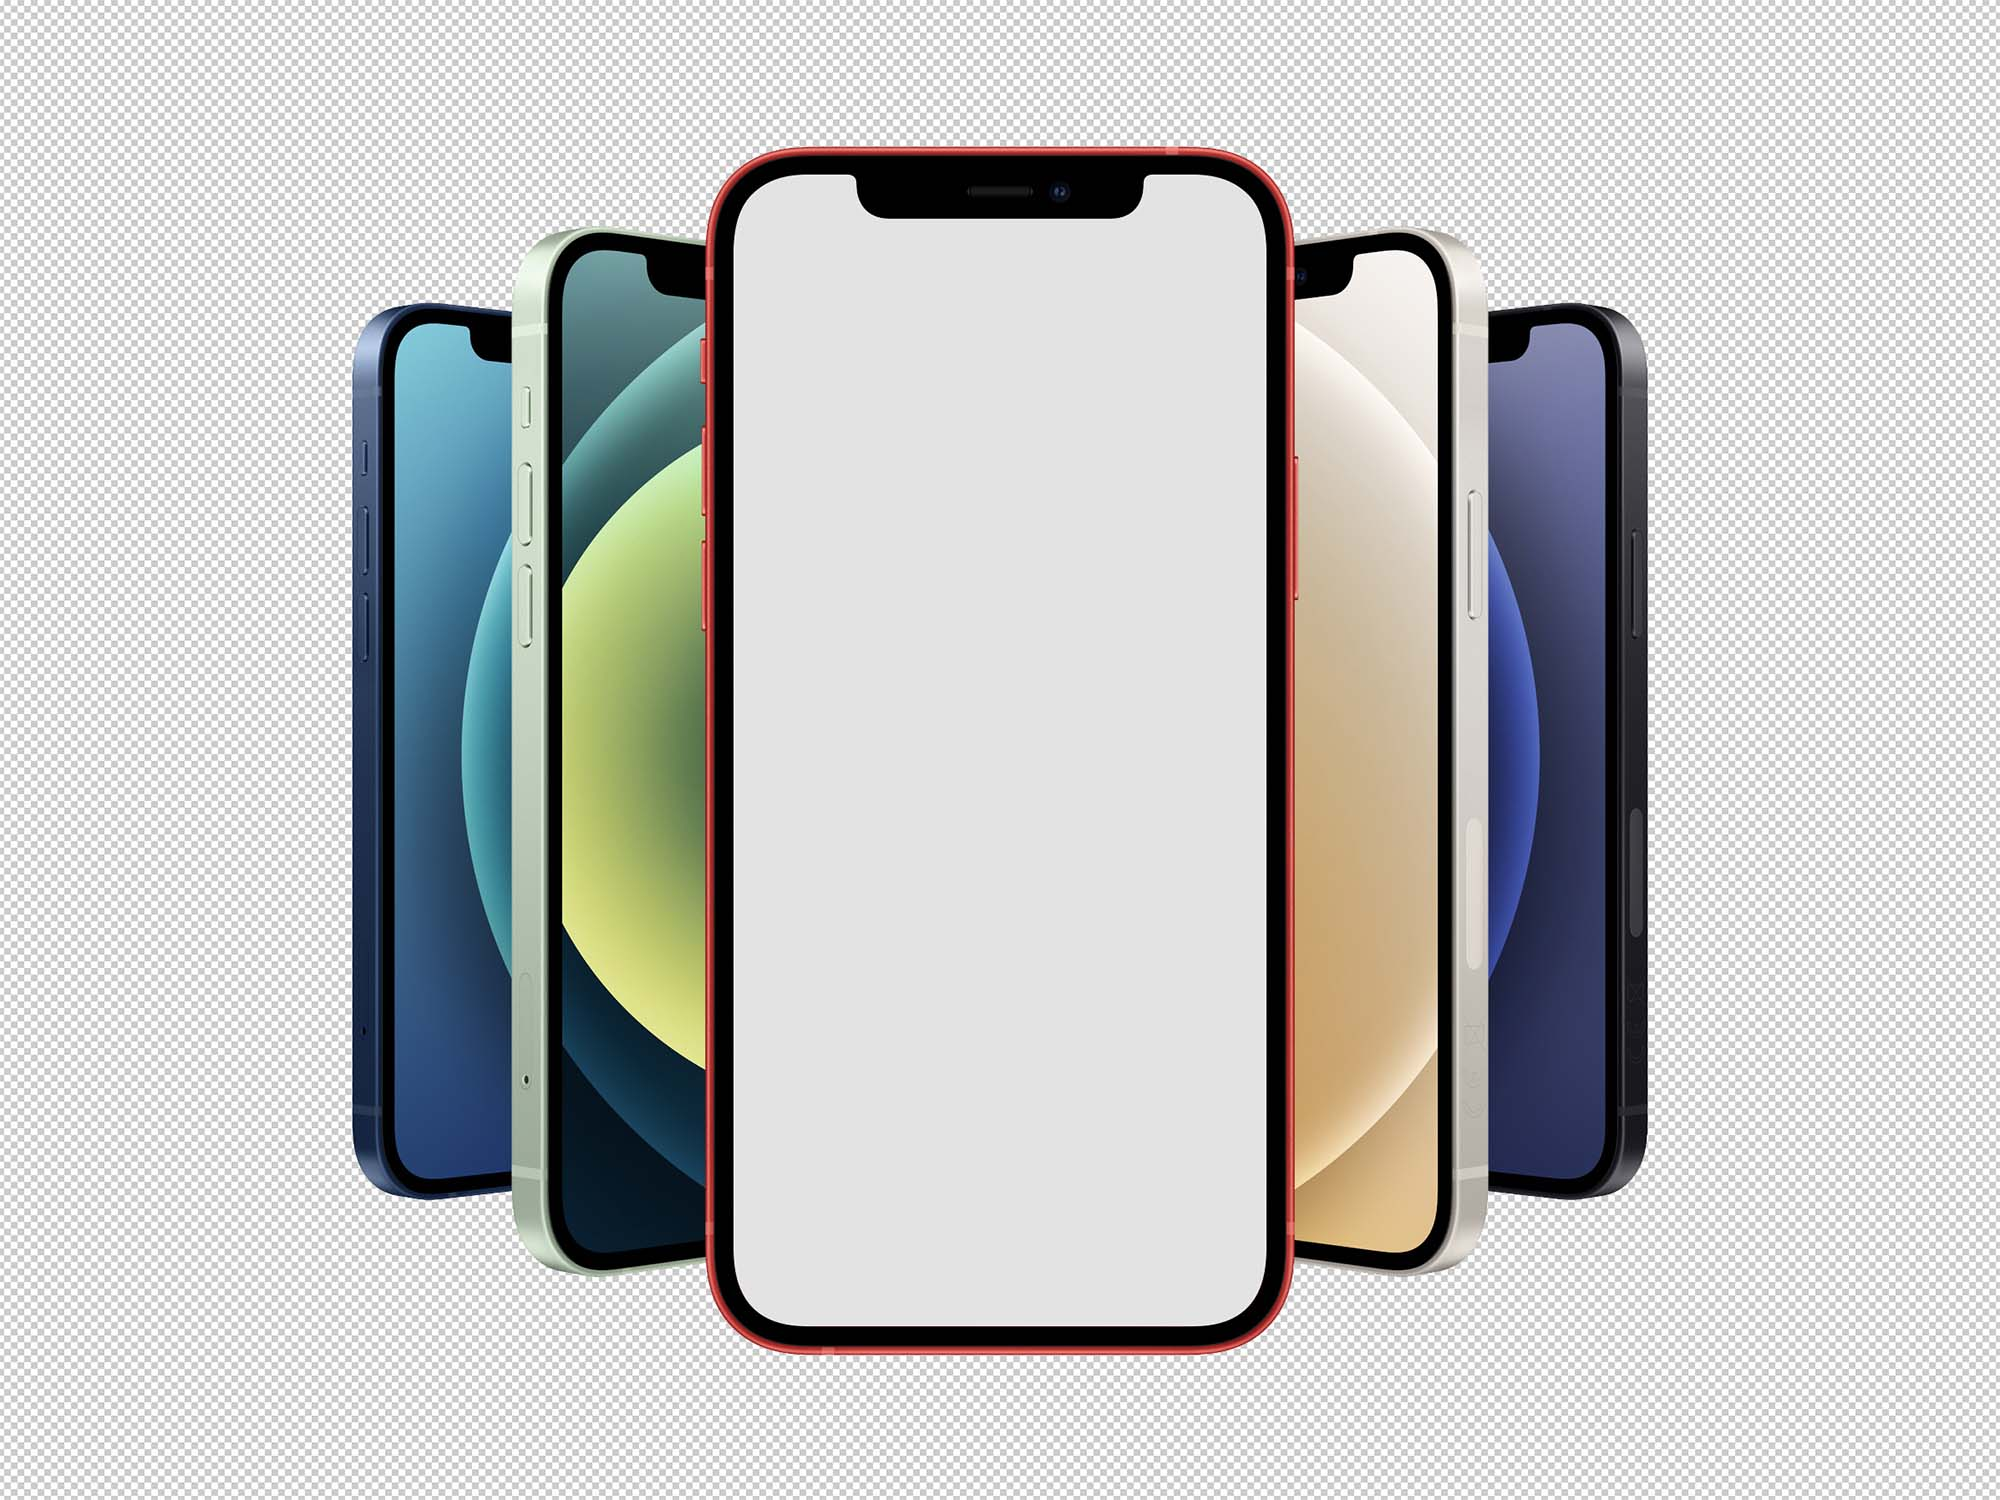 iPhone 12 Mockup 2